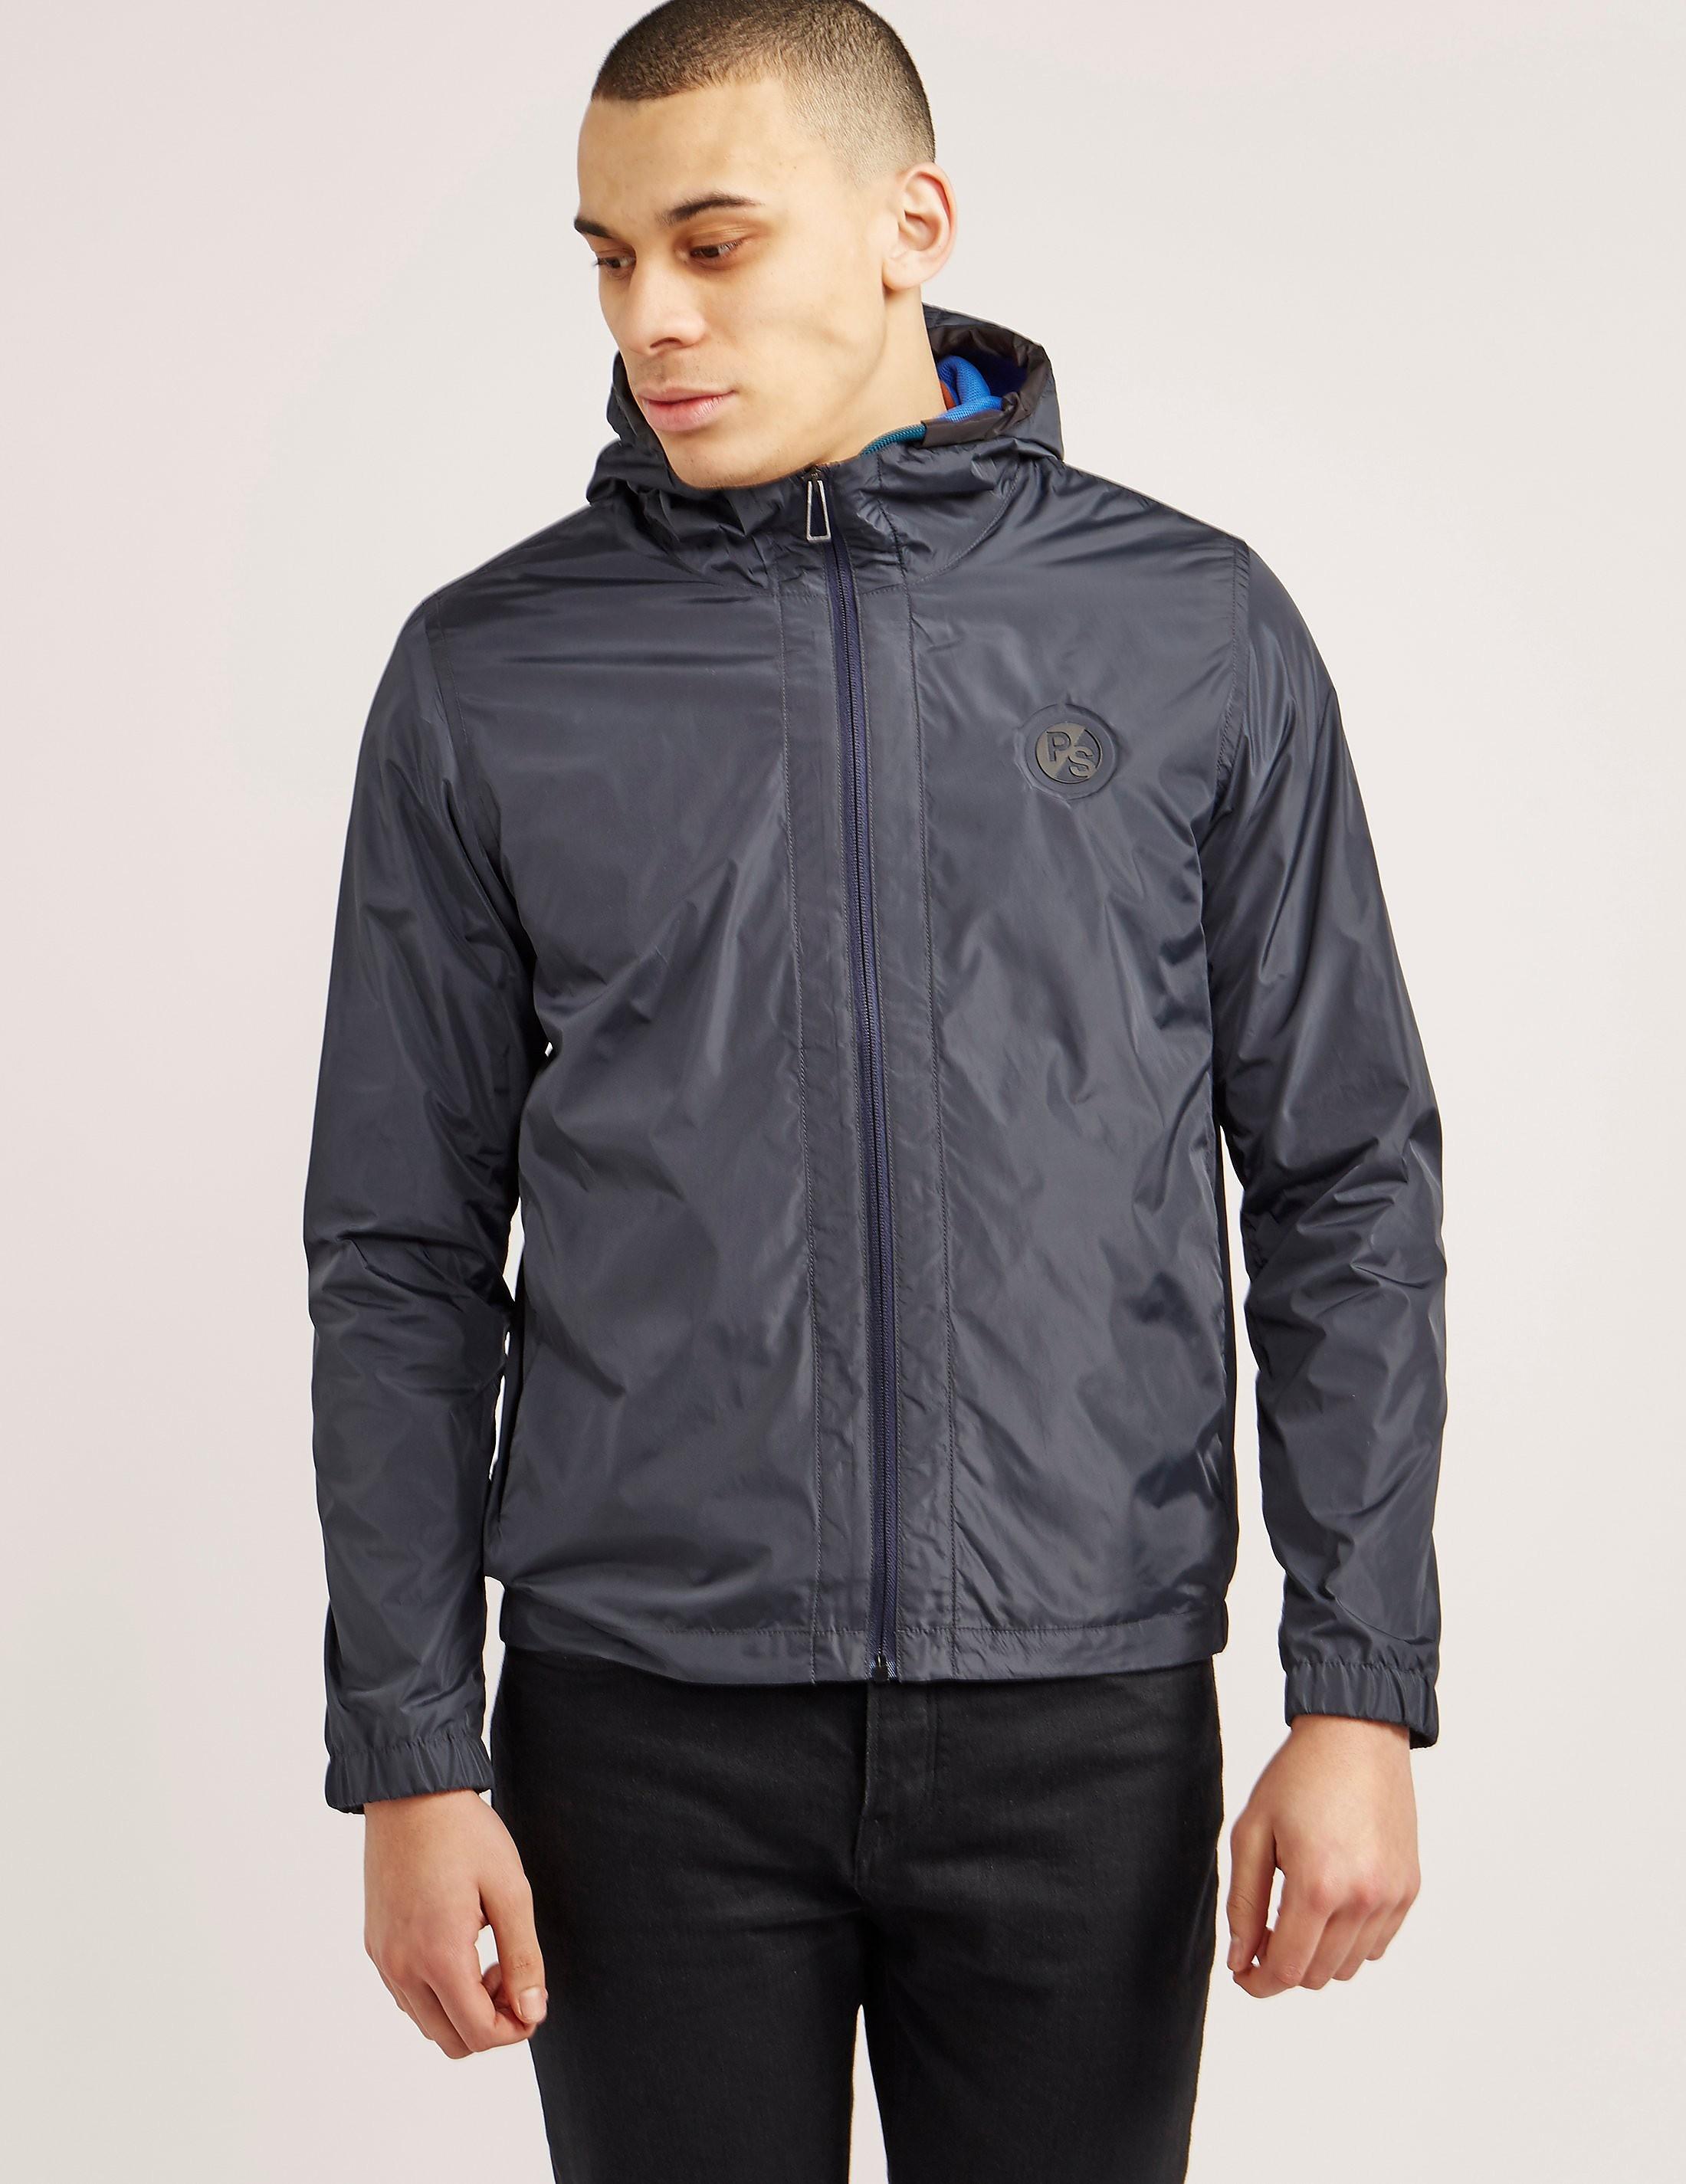 Paul Smith Shower Jacket